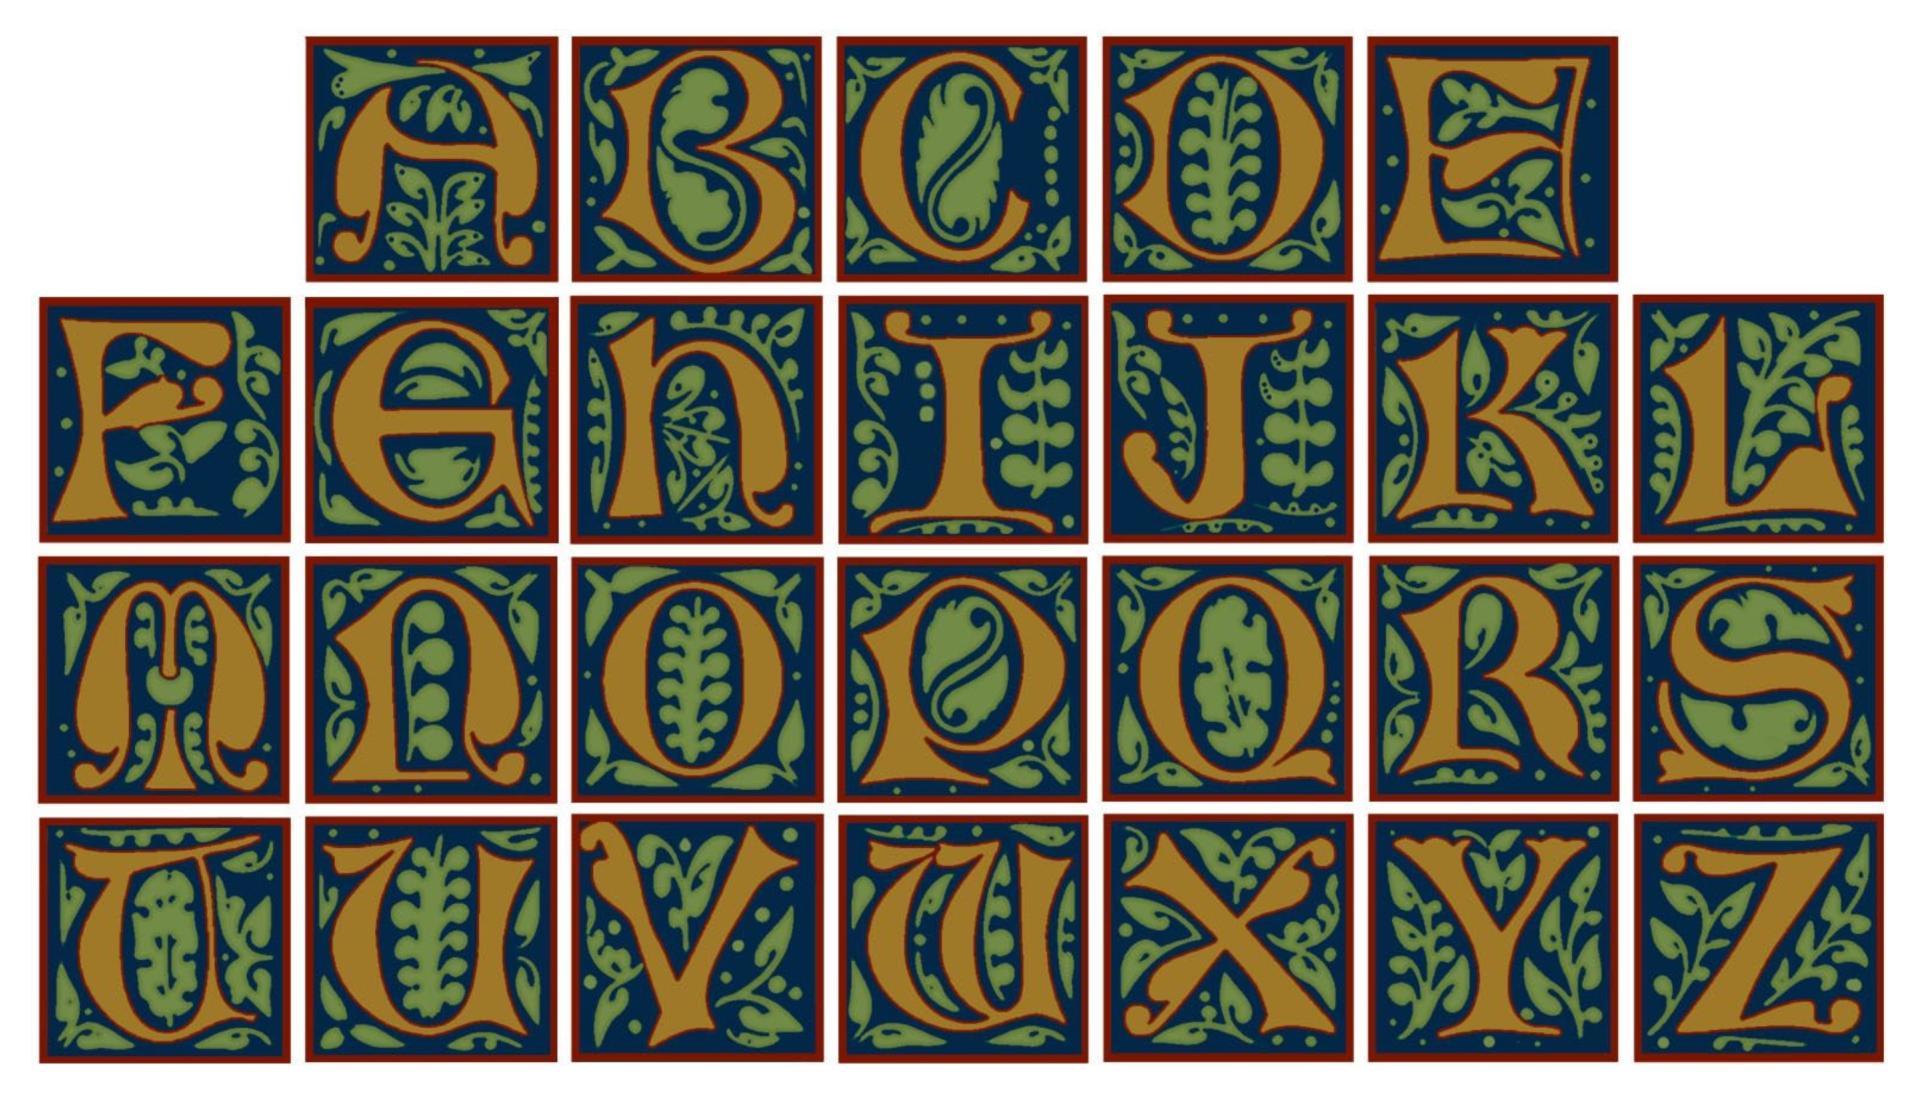 Illuminated Letter S Animal Design